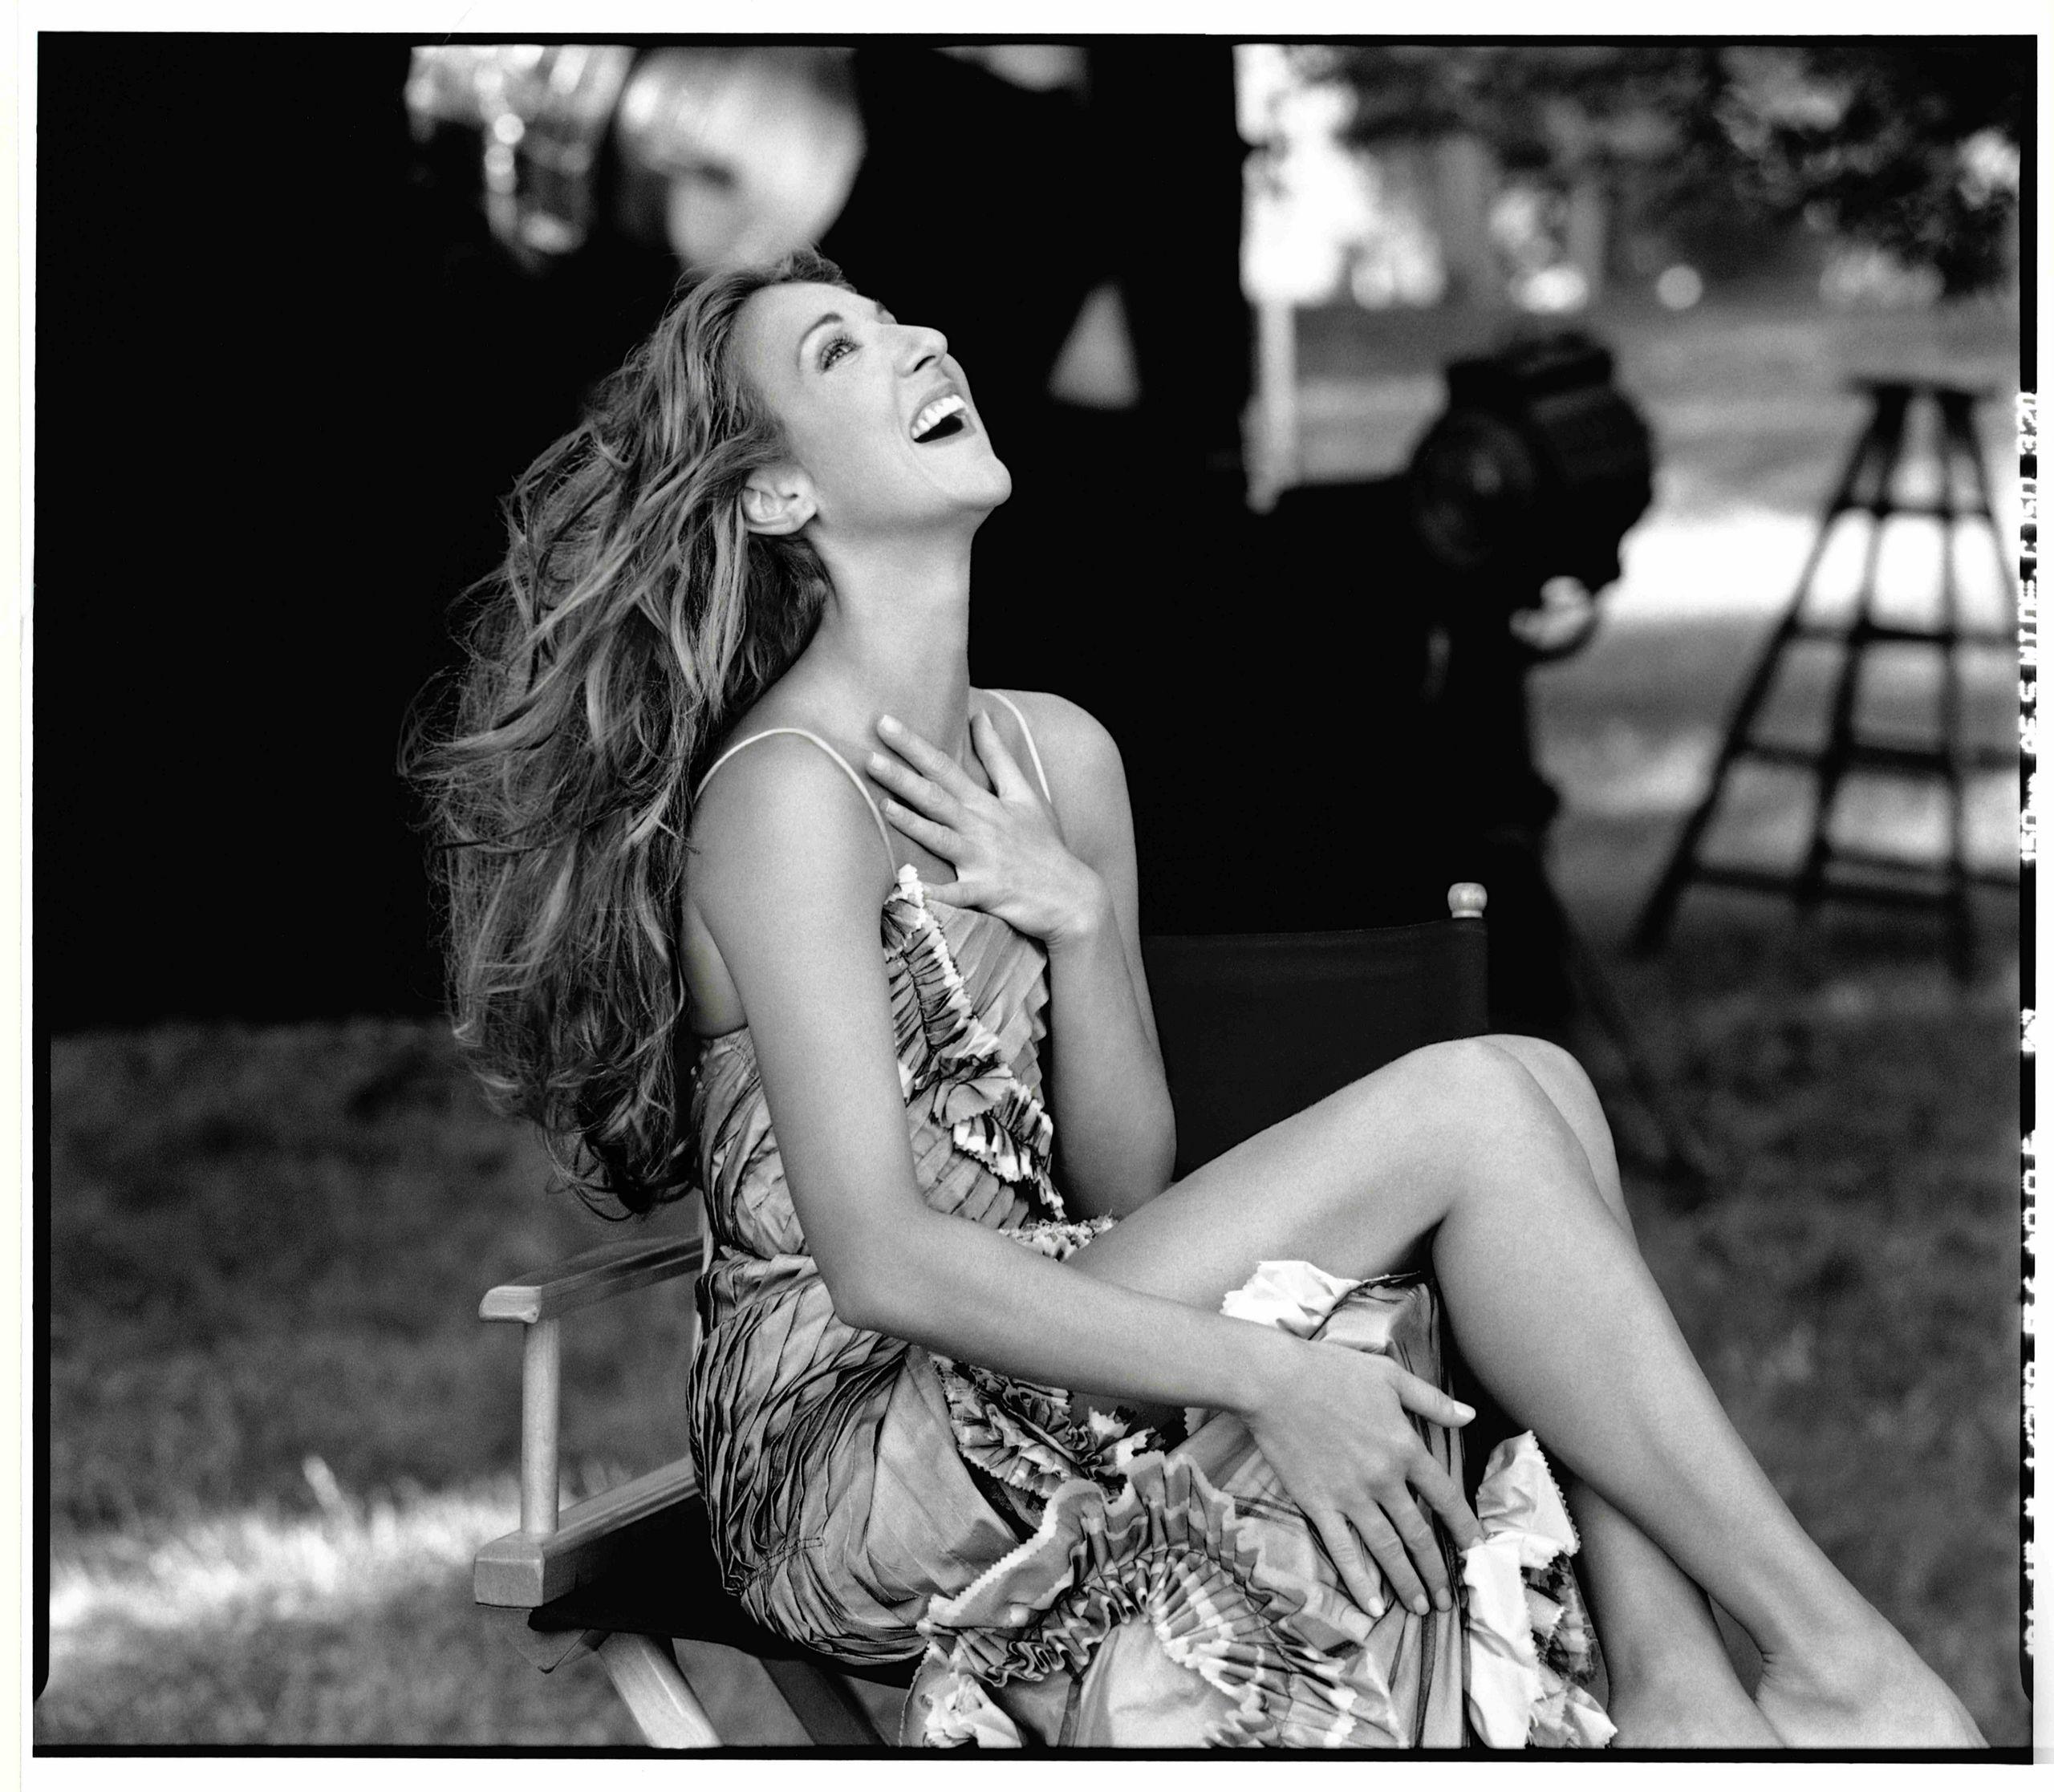 Celine Dion Images Icons Wallpapers And Photos On Fanpop Celine Dion Celine Marie Claudette Dion Singer